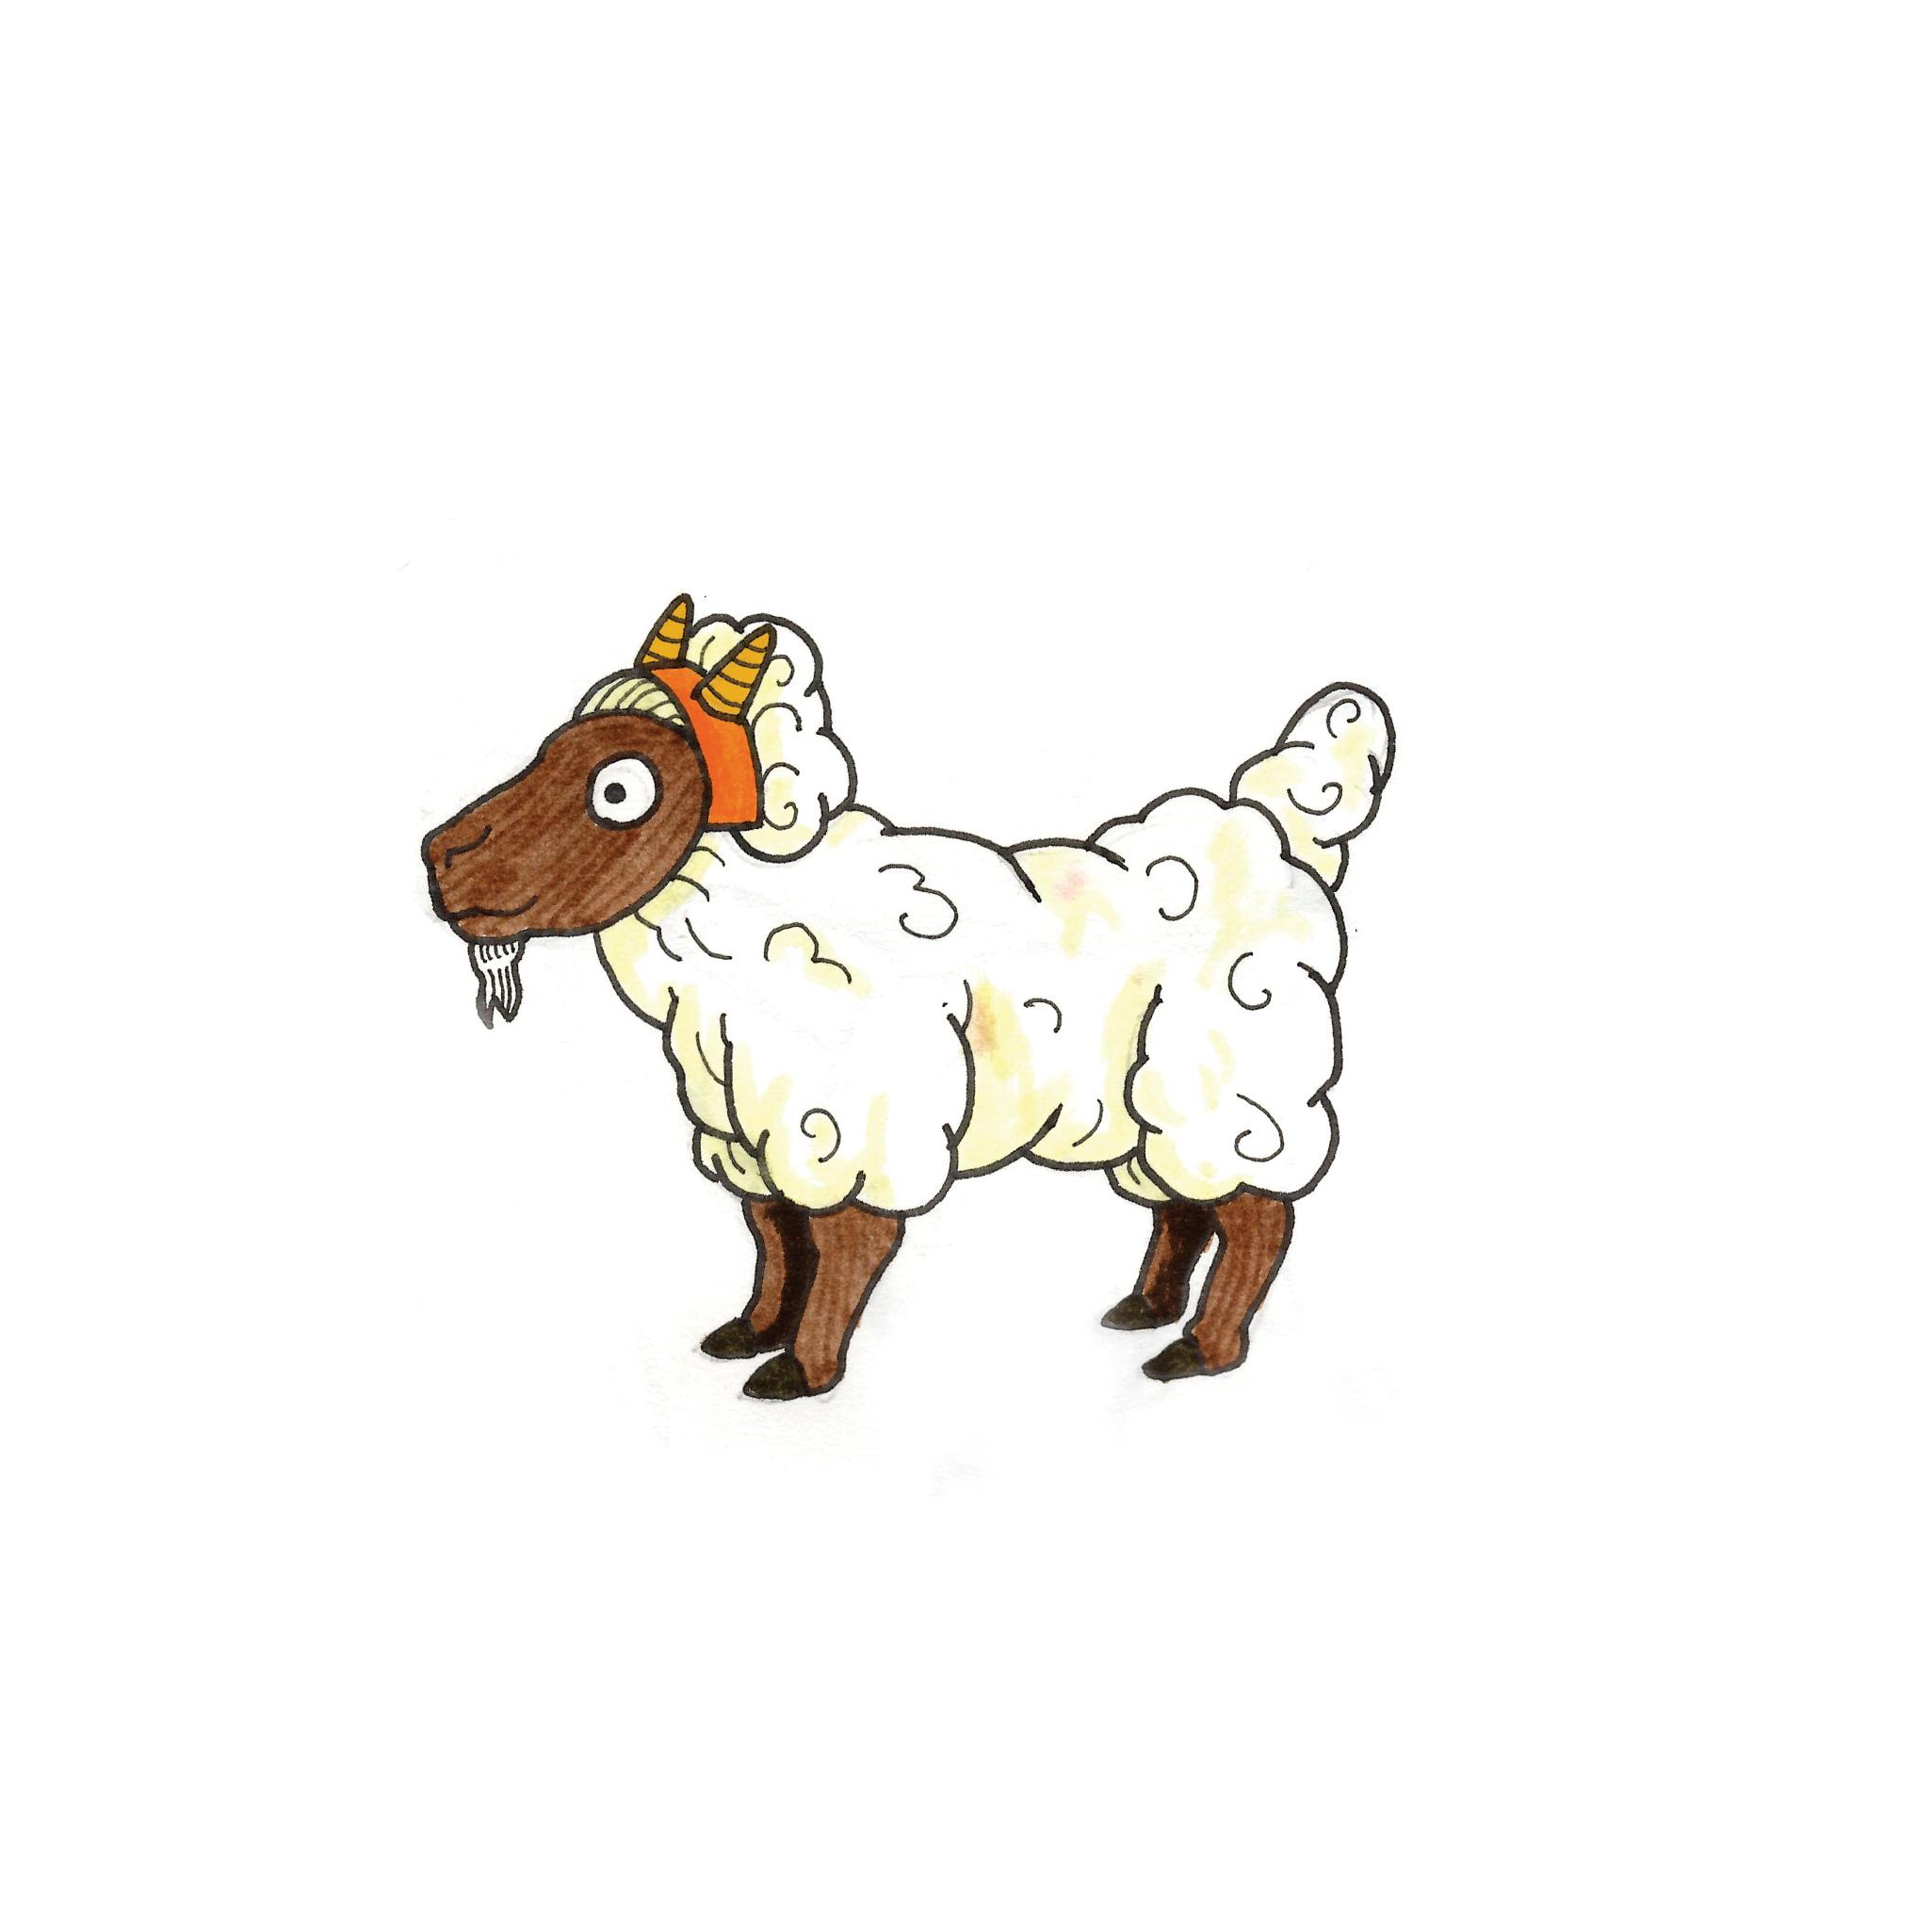 Sheep--character-01.jpg